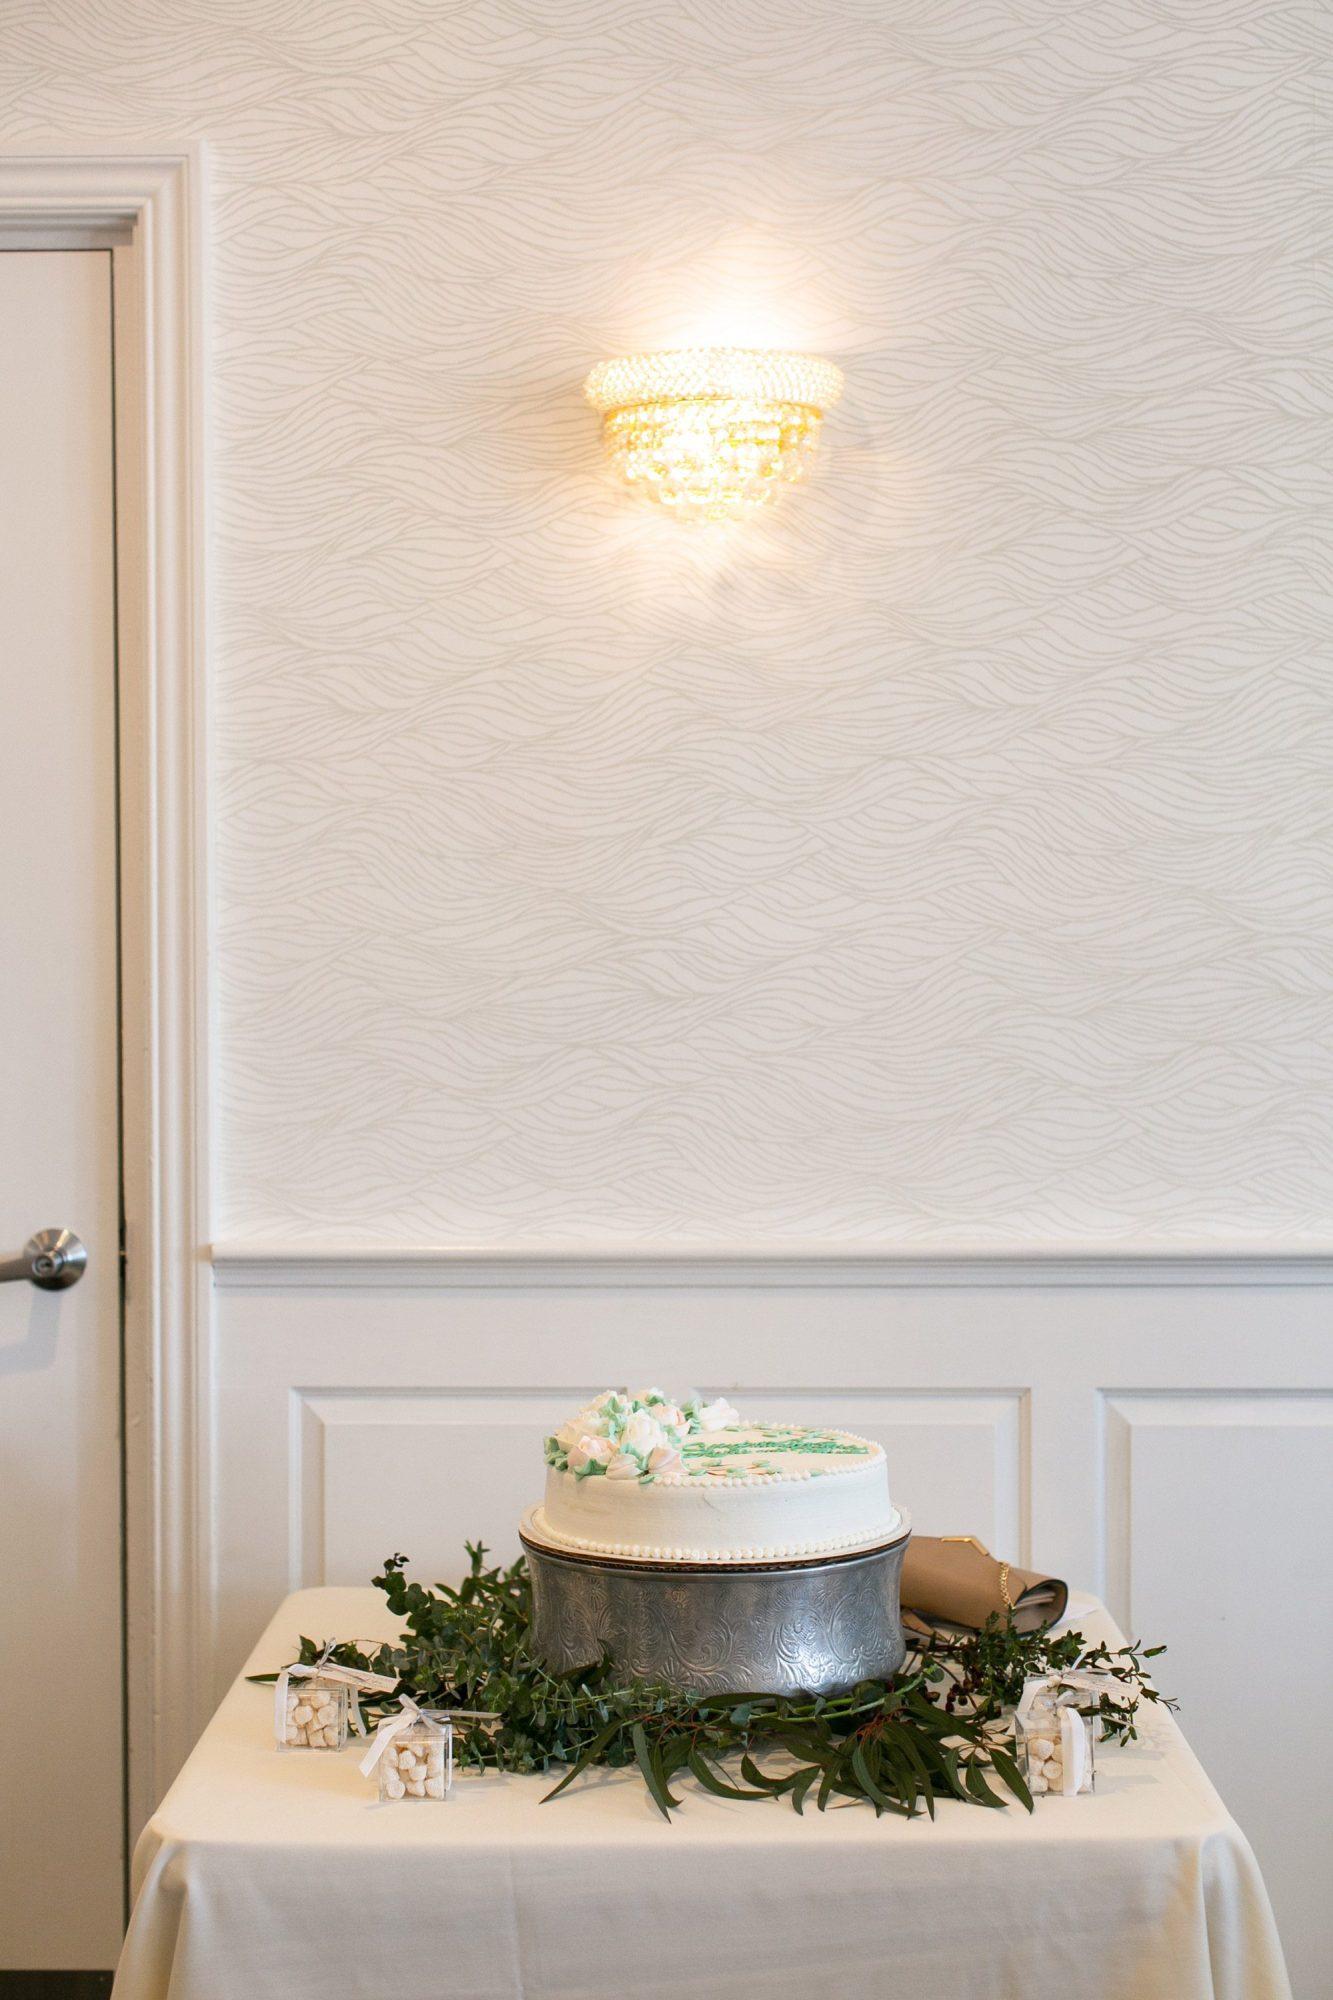 Captain's Quarters at Danversport decorated for a bridal shower